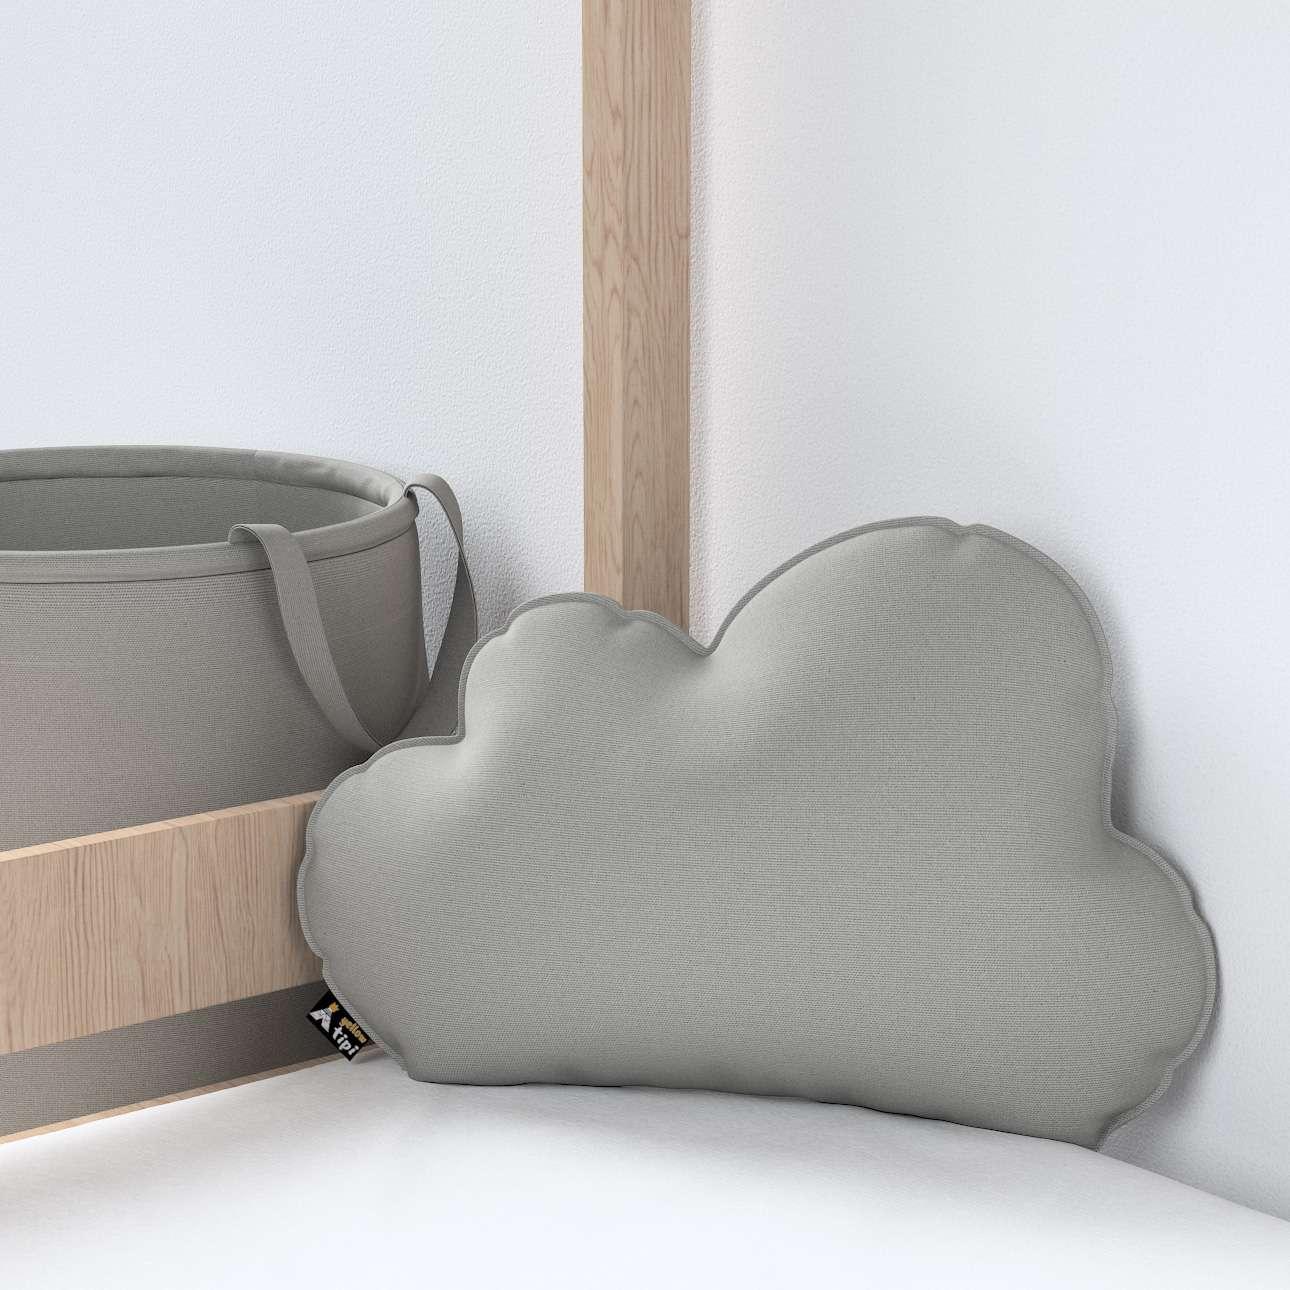 Soft Cloud pagalvėlė kolekcijoje Happiness, audinys: 133-24